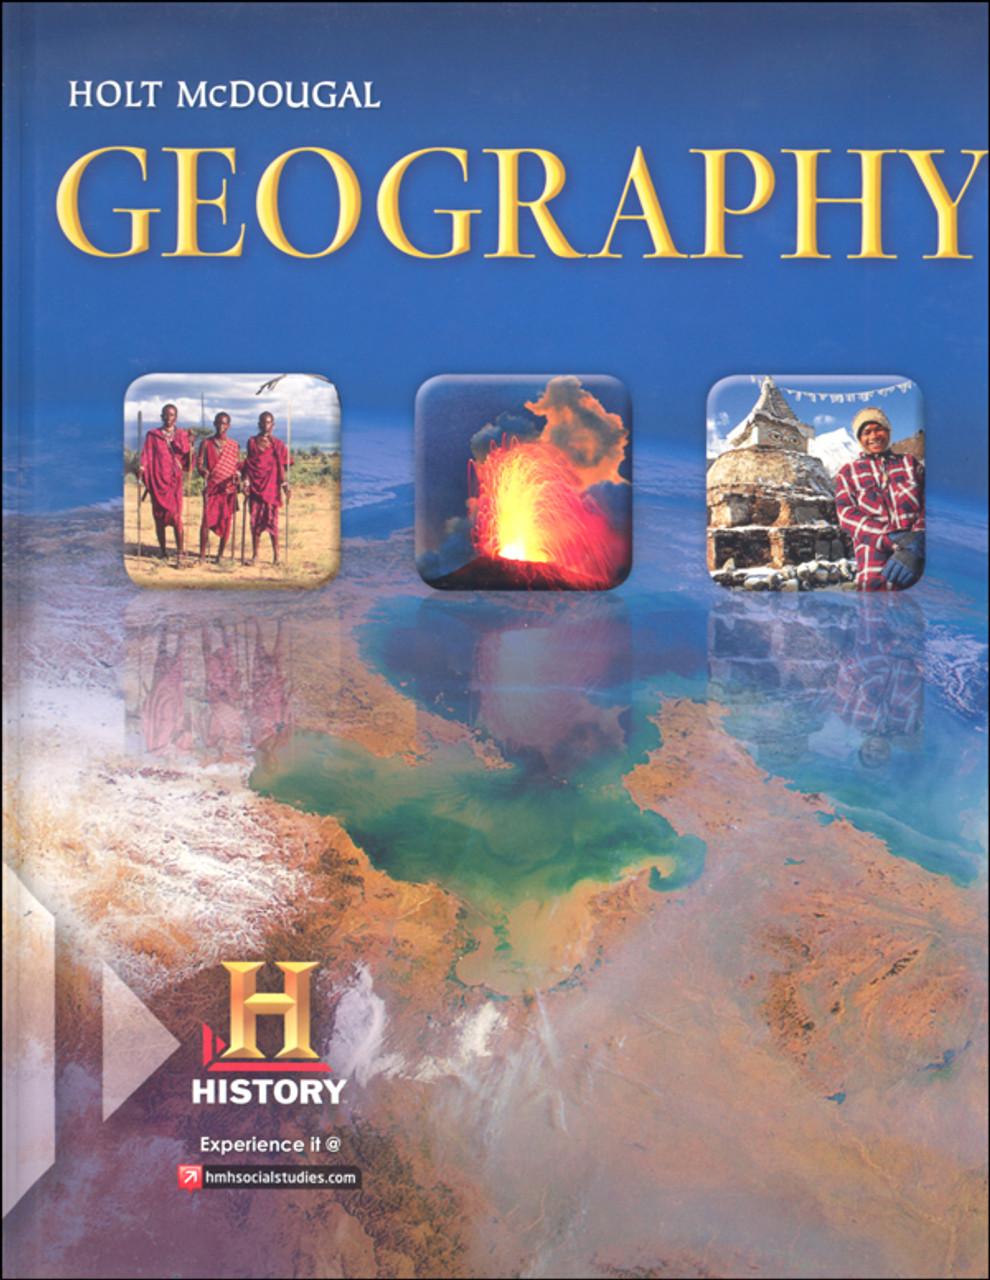 Holt McDougal Geography Grades 9 12 Student Textbook